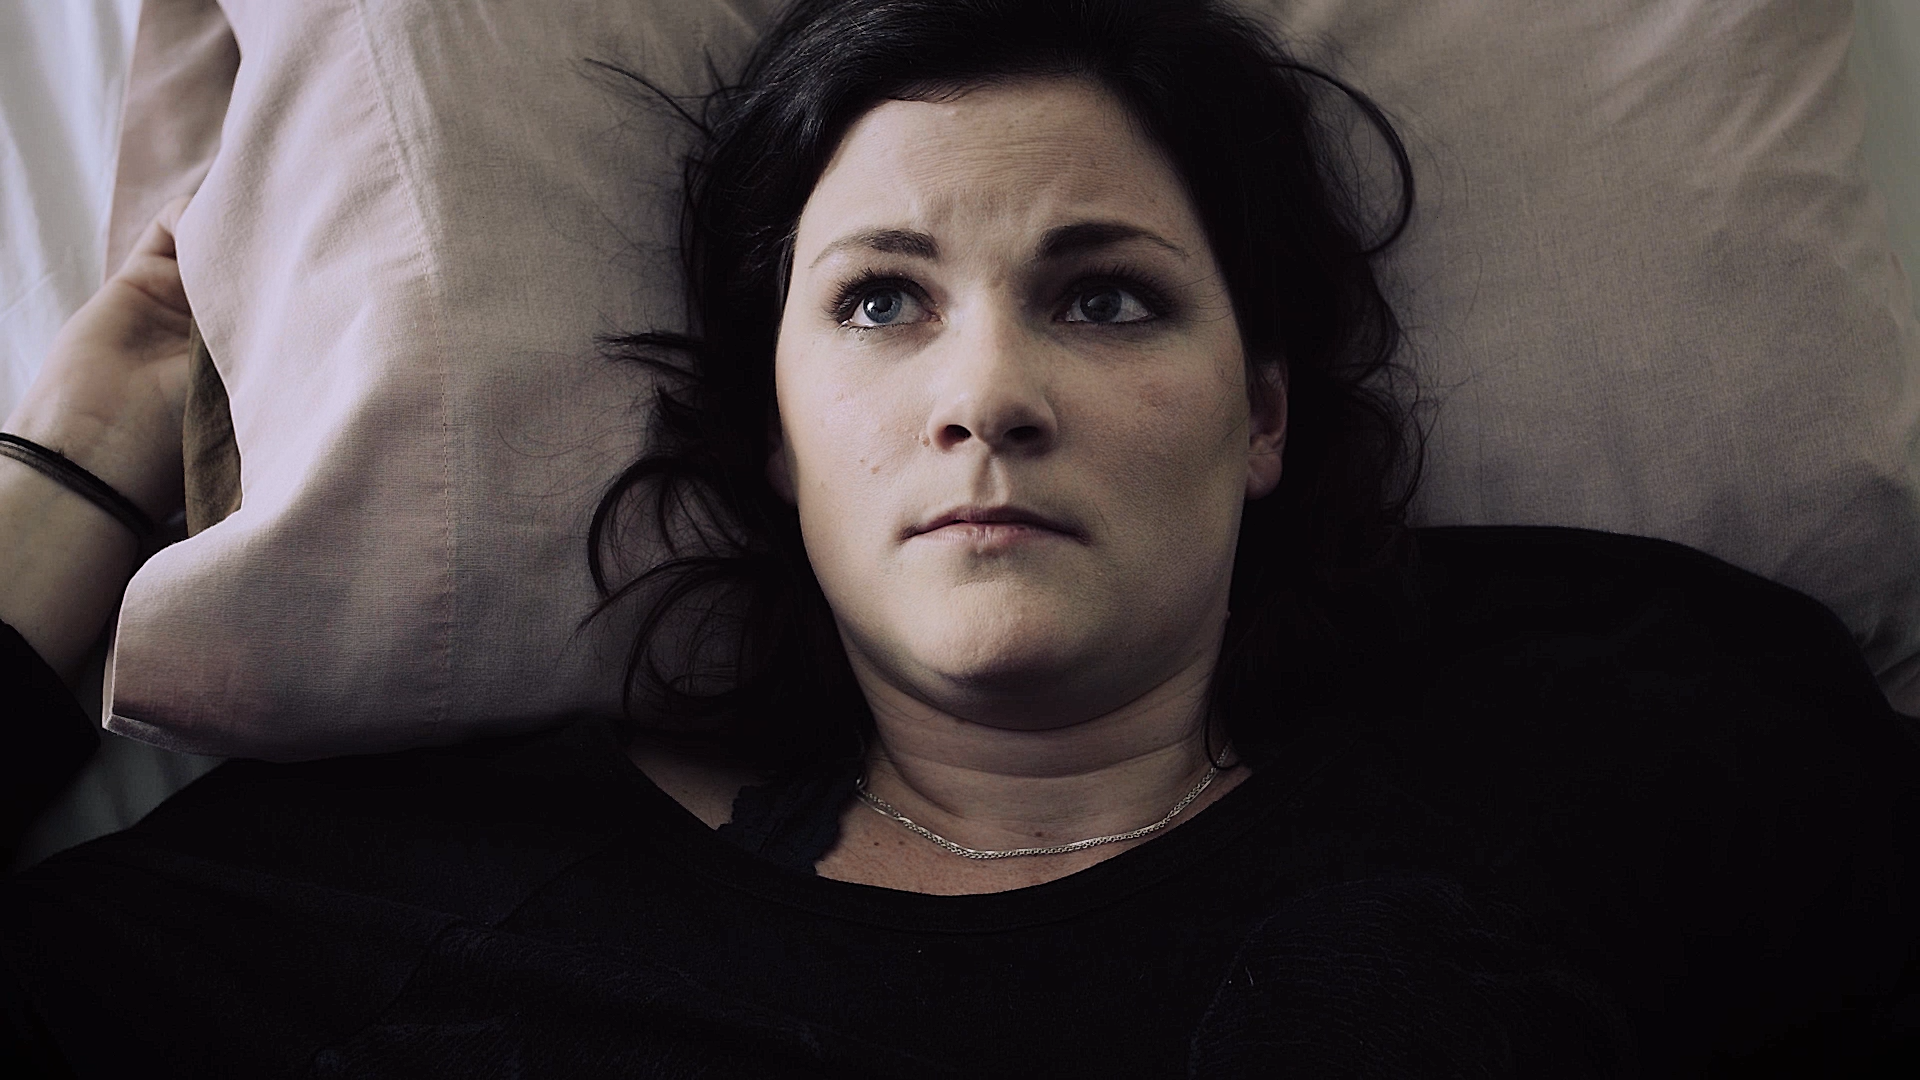 Liz Sandifer stars as Rebecca in the award-winning student short film by Michelle Noland.